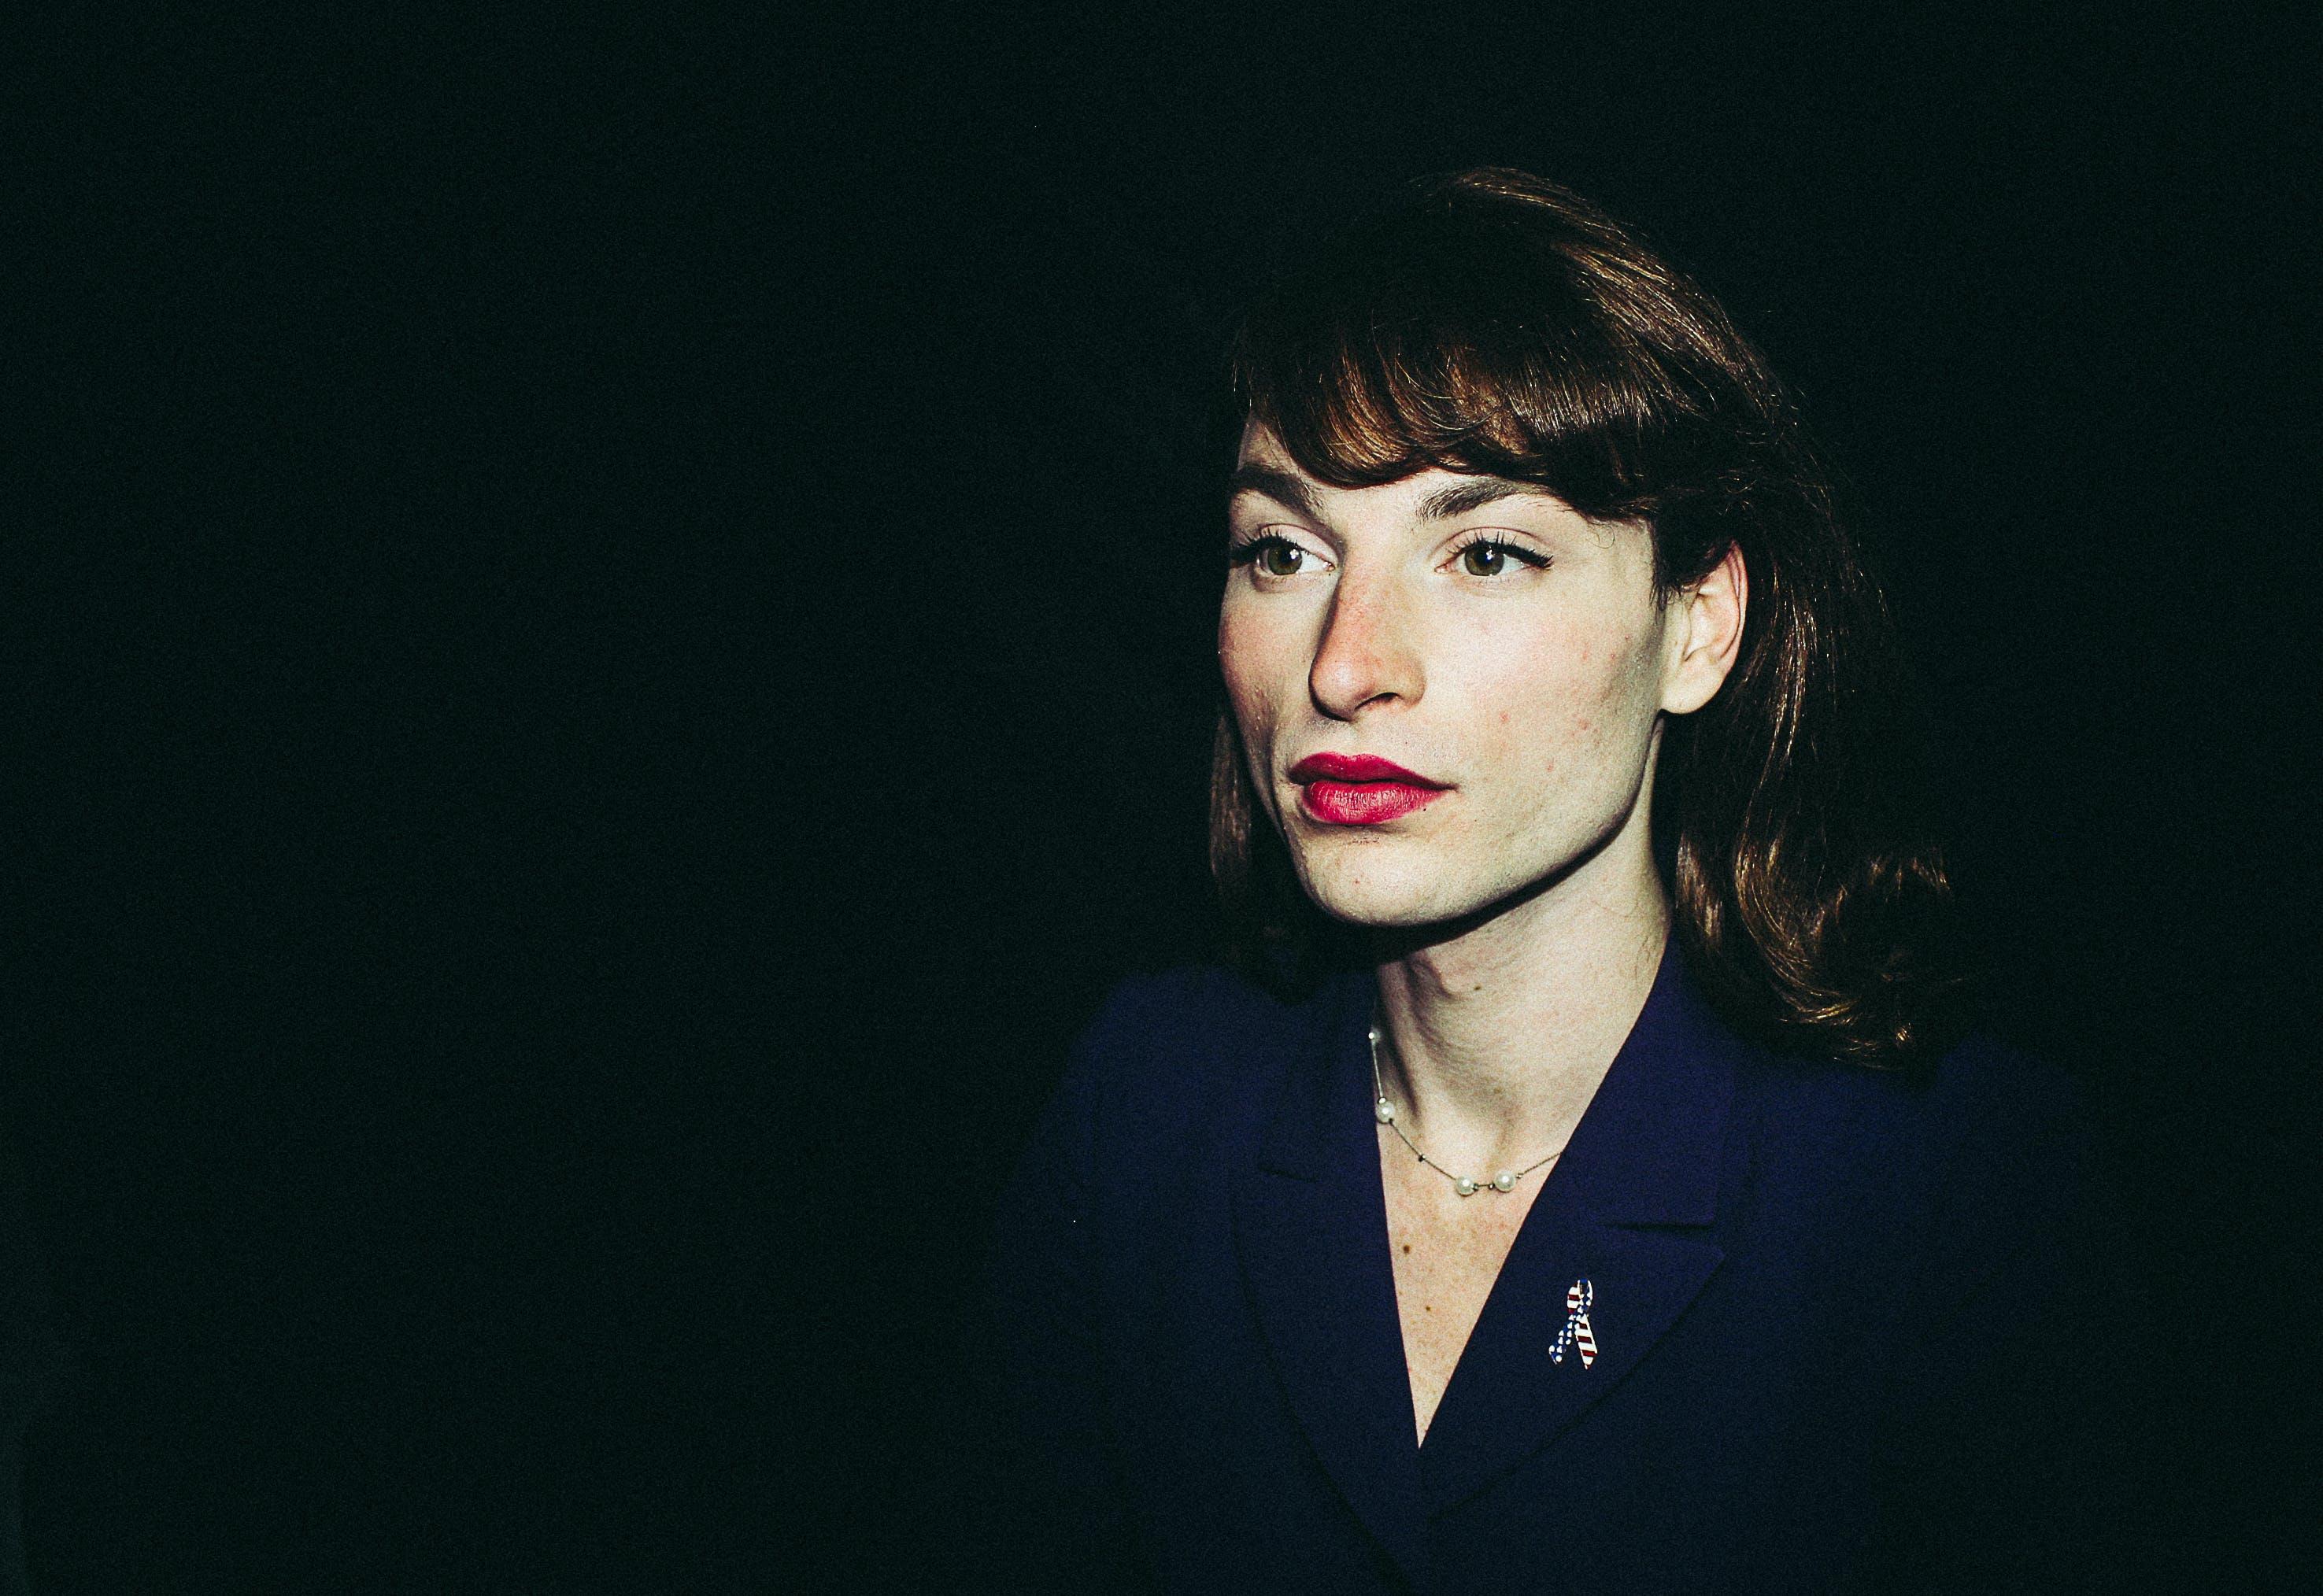 Foto stok gratis background hitam, bibir, bibir merah, cewek